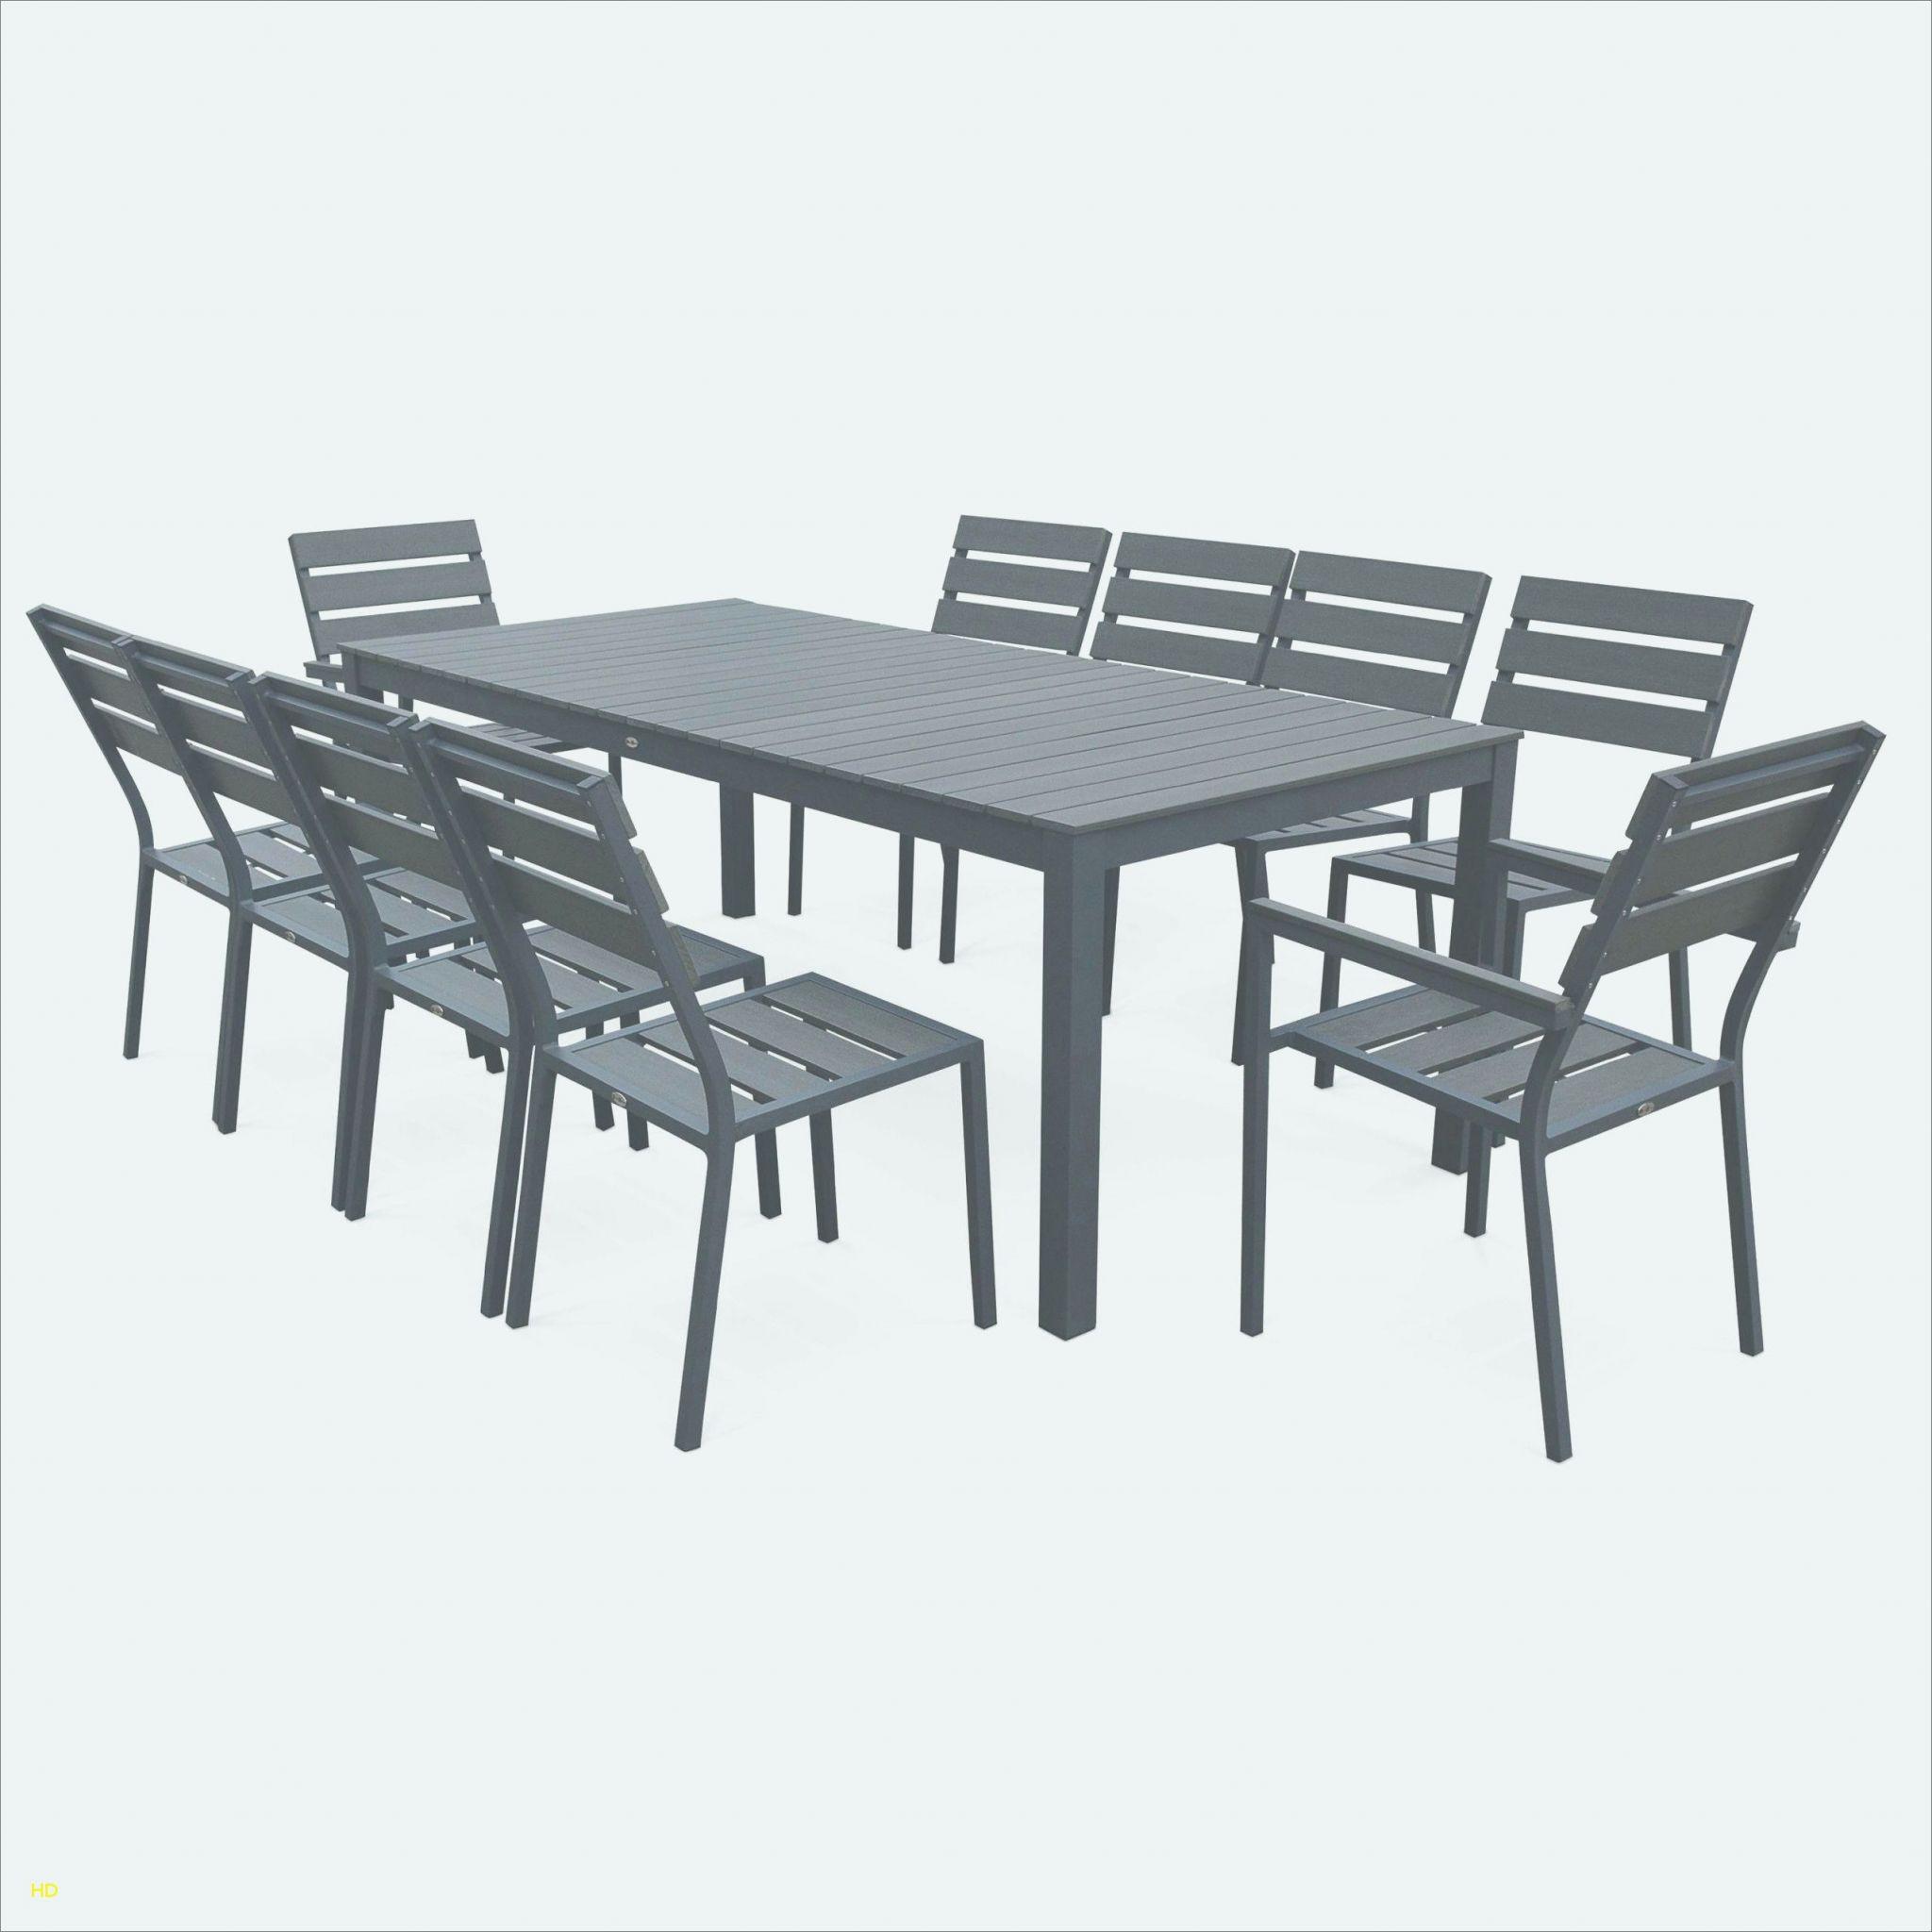 Solde Table Beau 98 soldes Meubles De Jardin